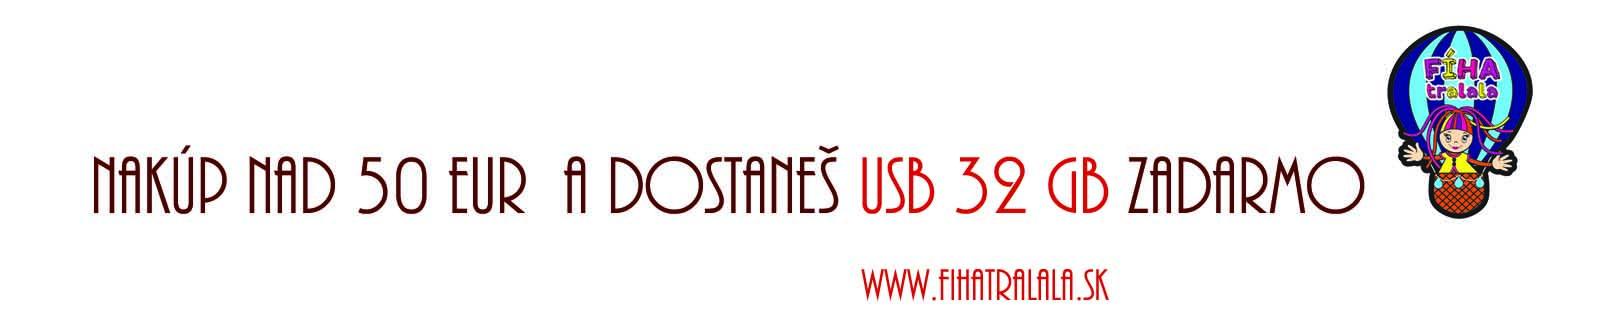 USB ZADARMO nad 50 EUR